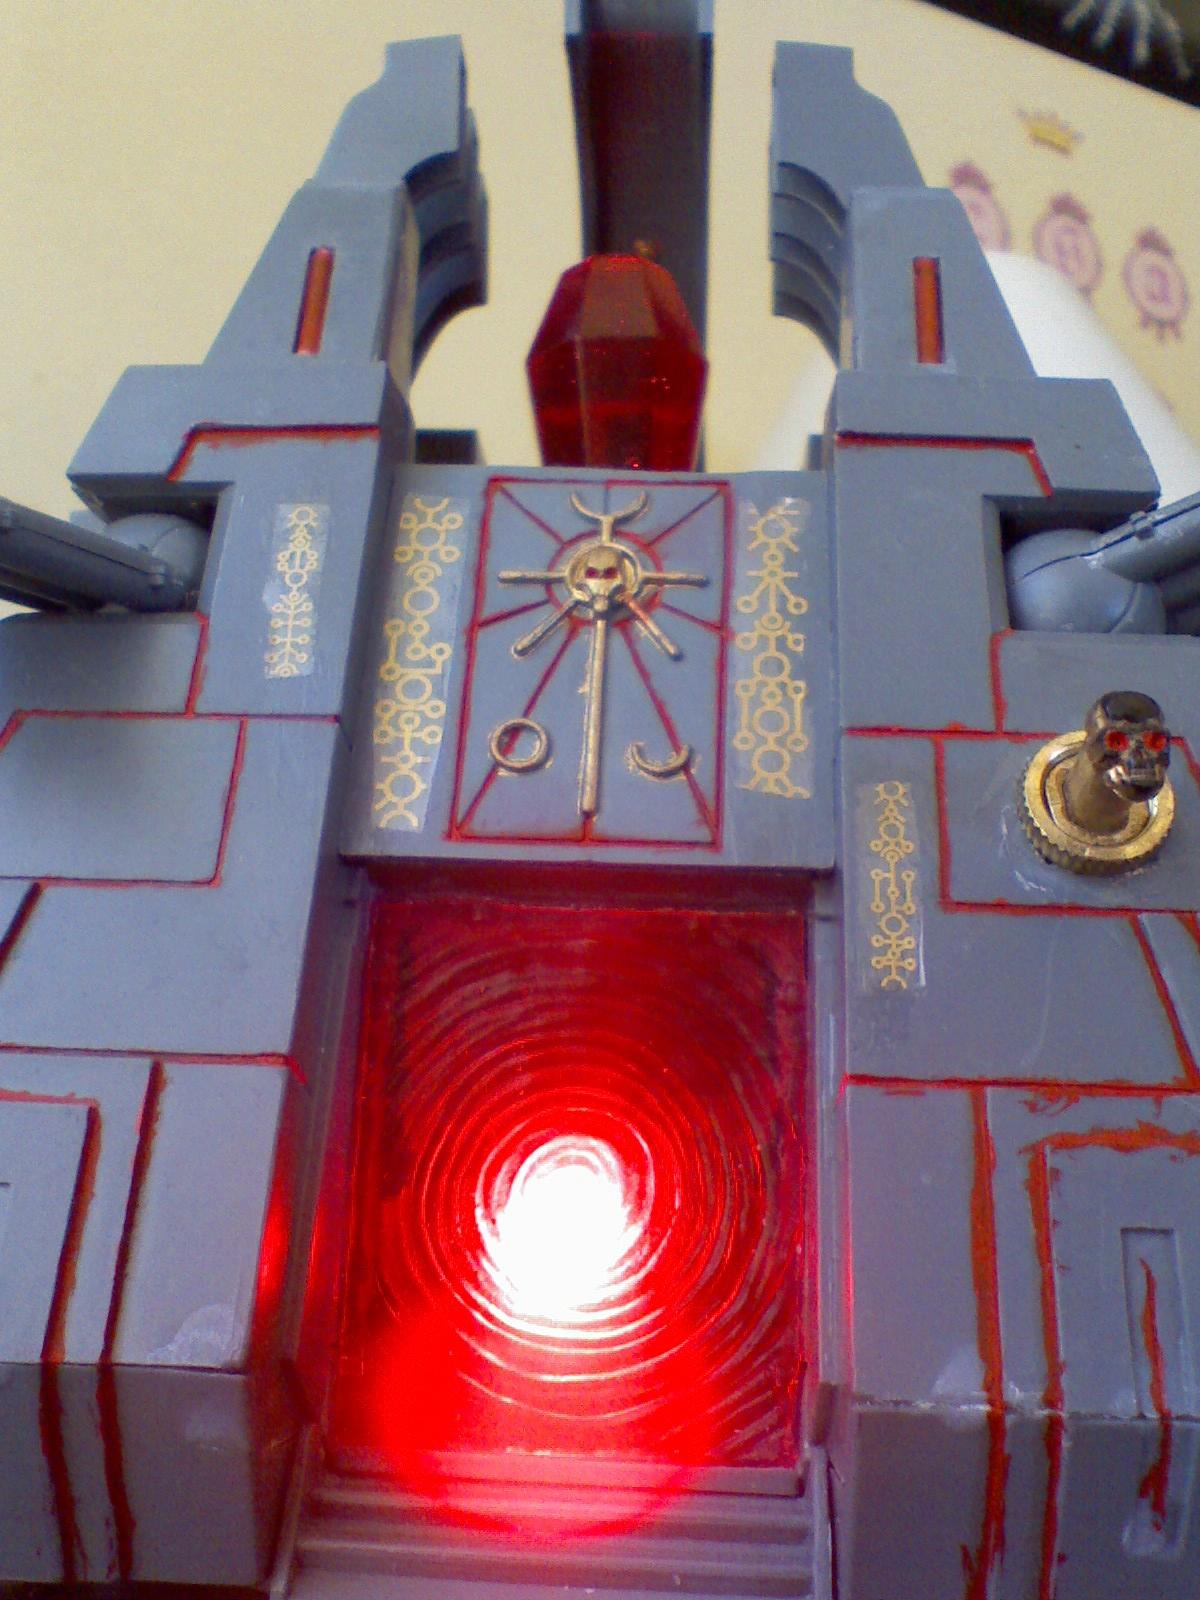 Light, Monolith, Necrons, Red, Warhammer 40,000